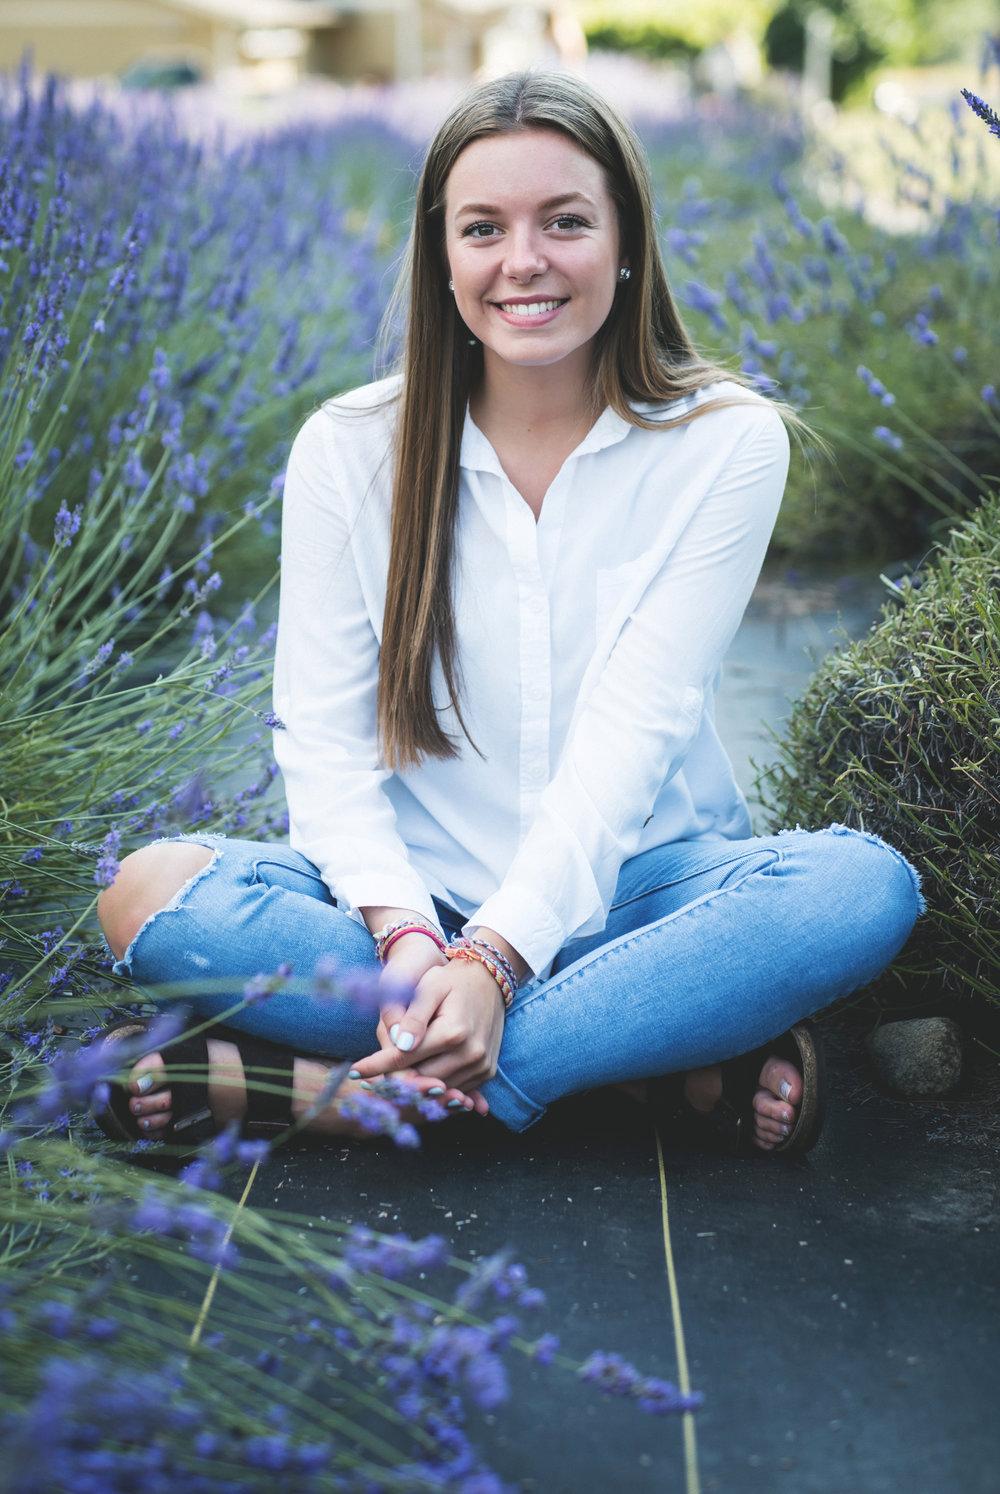 Kristin Grover Images. Lavender fields. Senior photos. Sarah senior model sitting